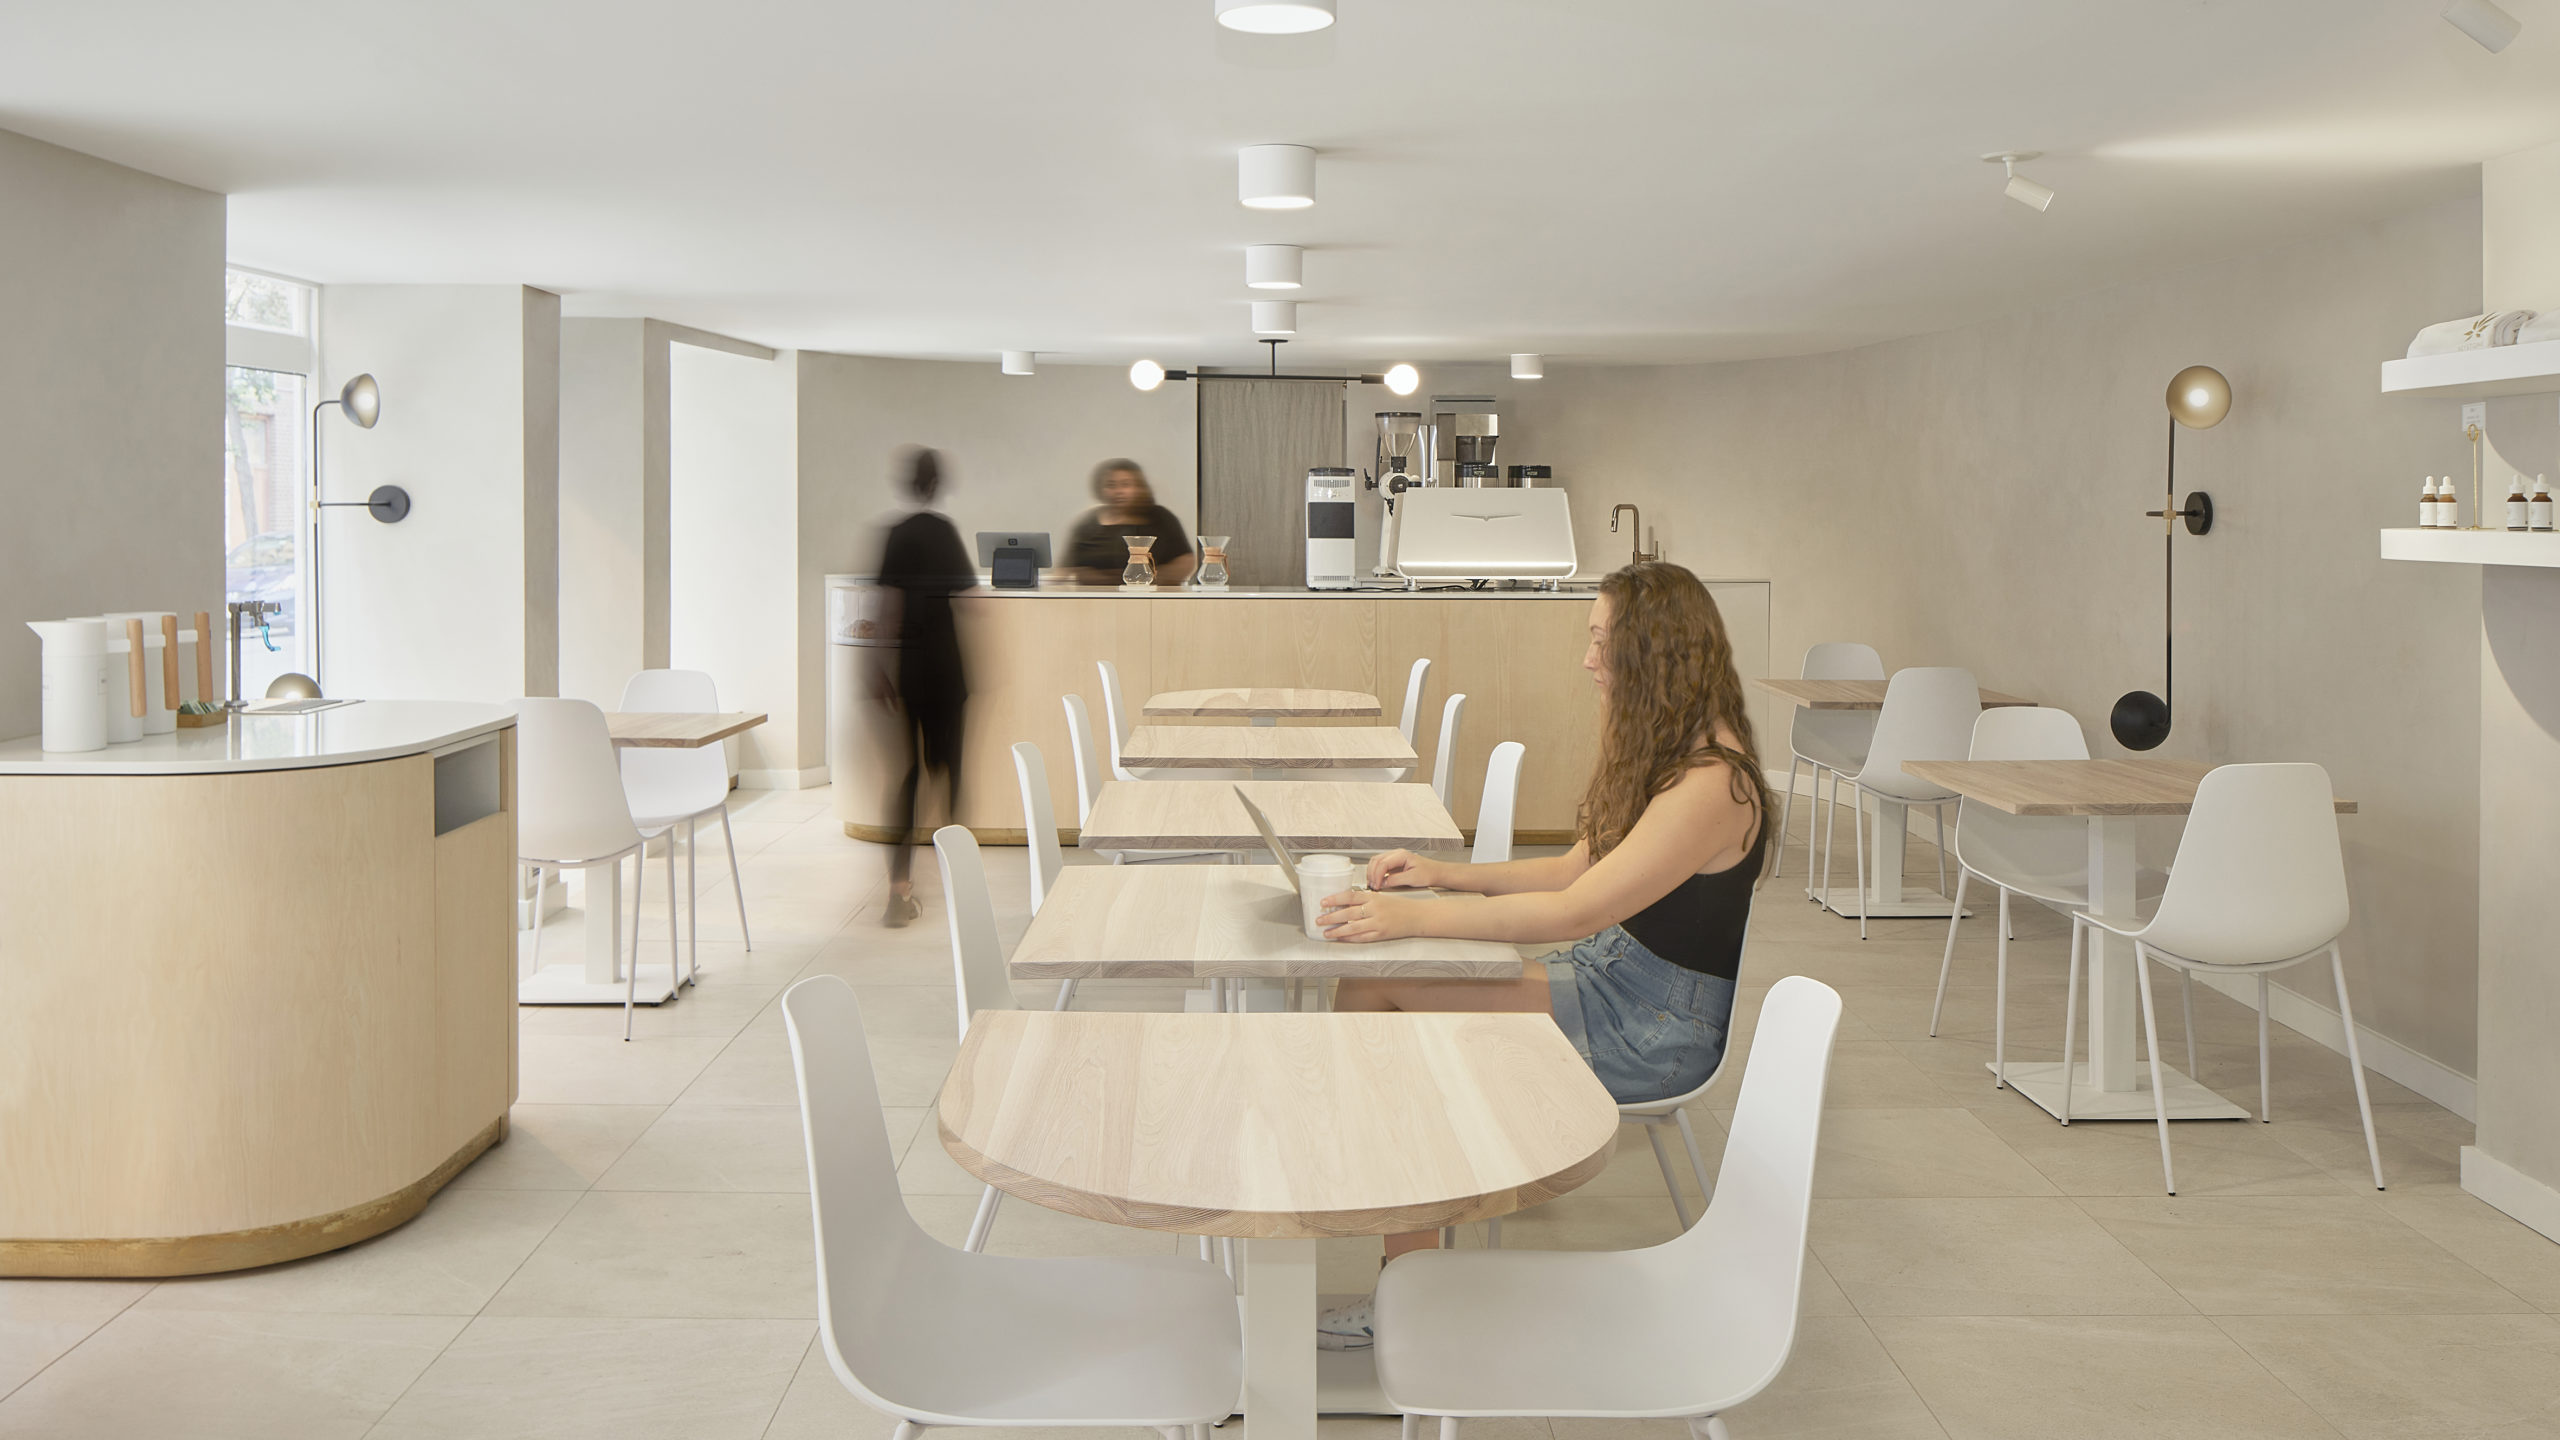 Project designer at LO Design in Philadelphia, USA.